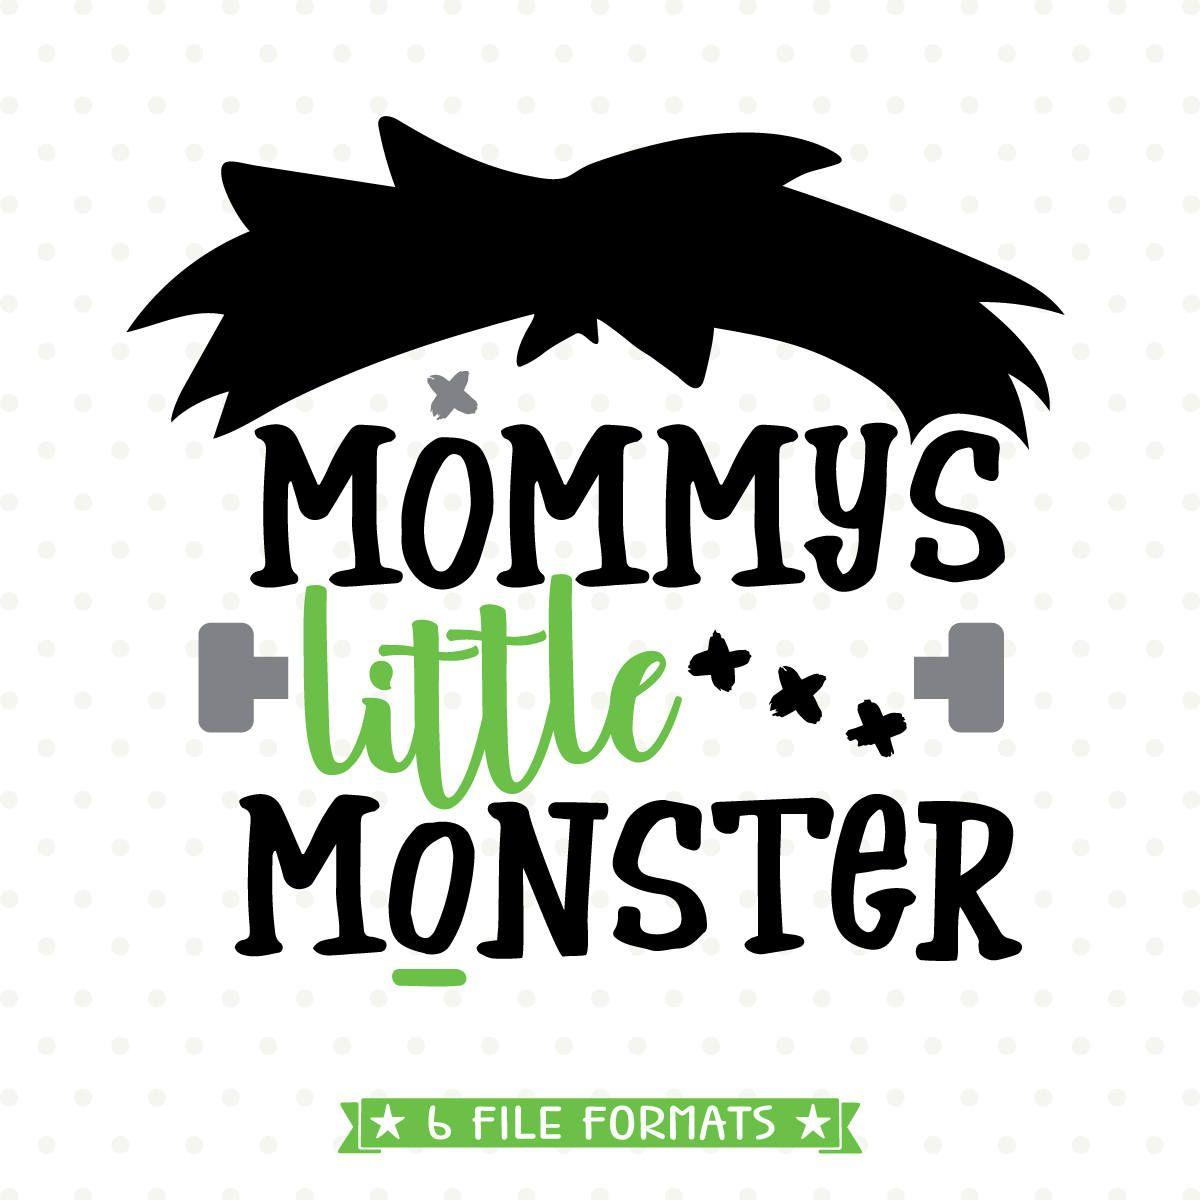 Mommys Little Monster Svg File Halloween Svg Boys Halloween Etsy Halloween Shirts For Boys Cricut Halloween Halloween Vinyl